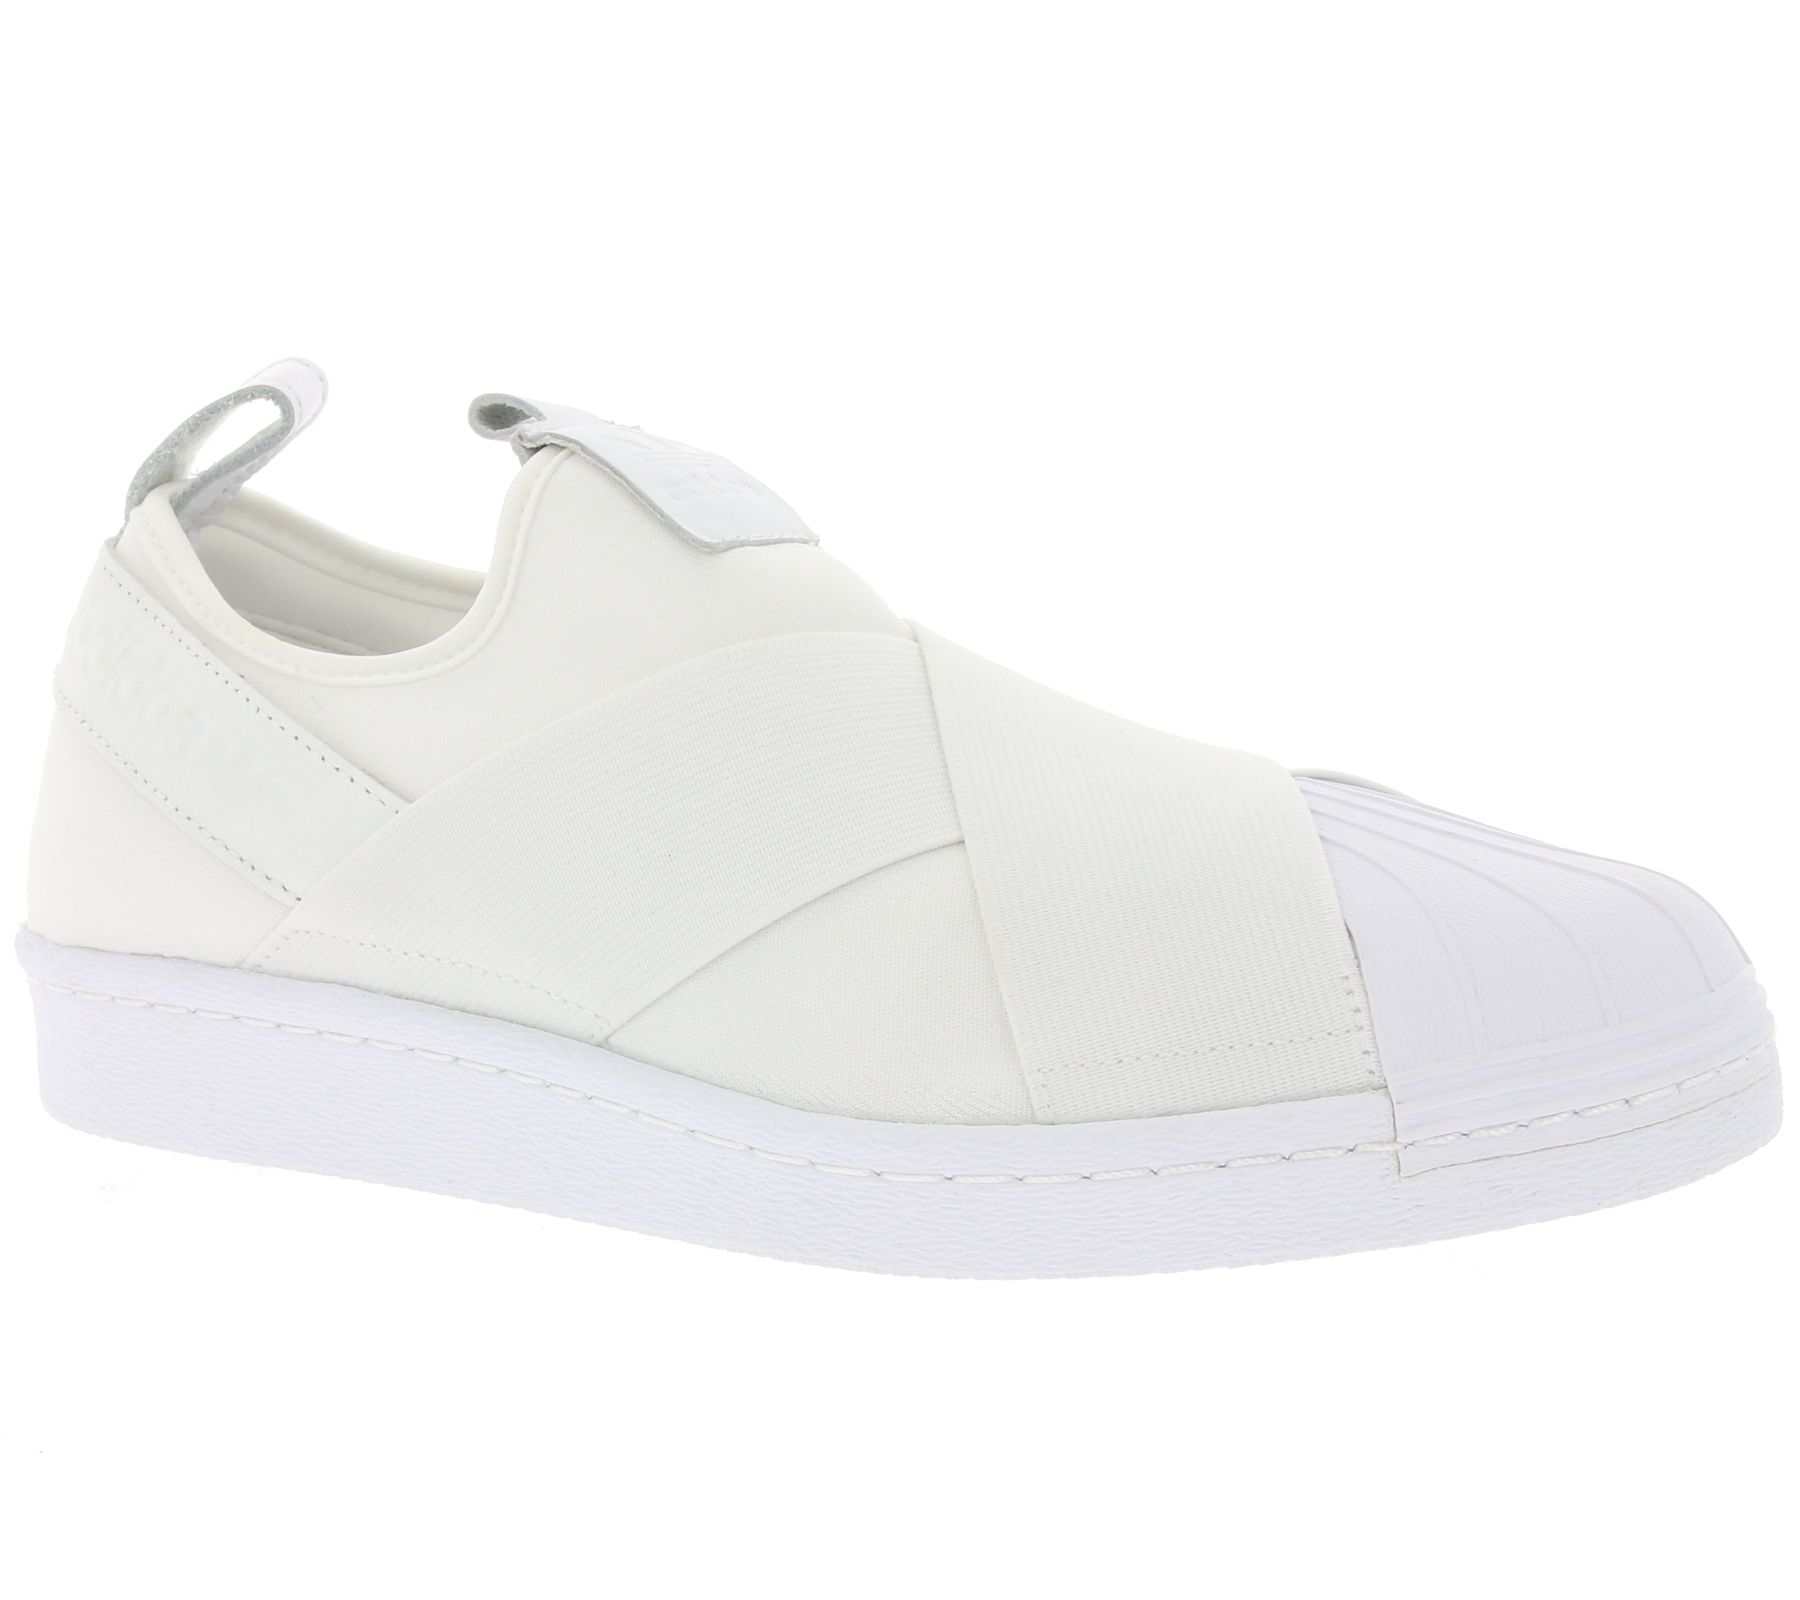 timeless design 52863 1db48 69,99 €    adidas Originals Superstar Slip On Sneaker Weiß